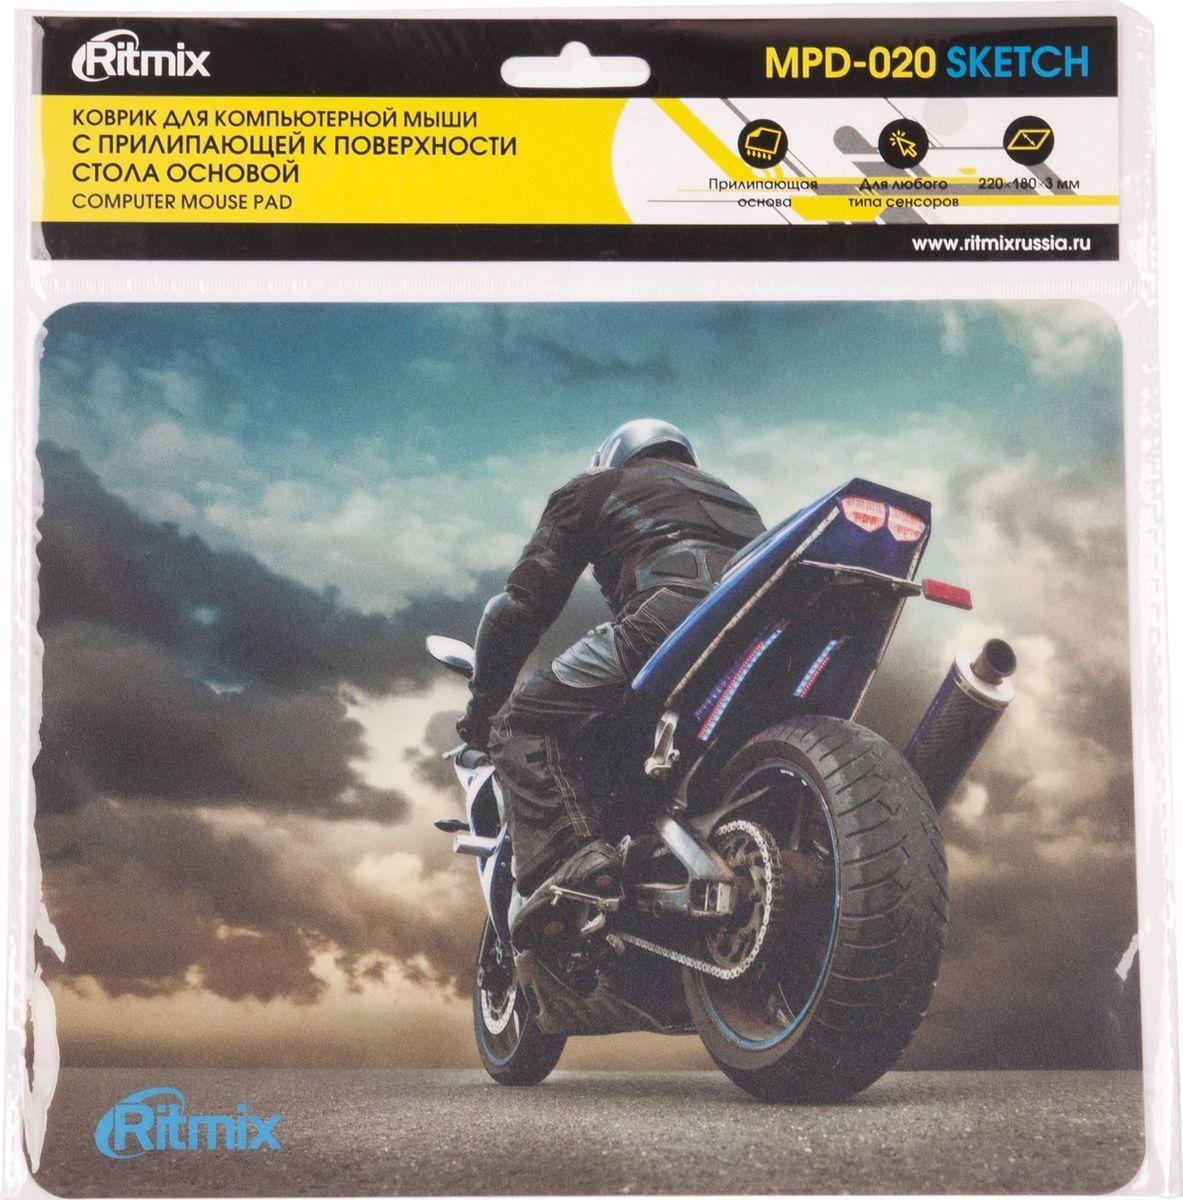 Коврик для мыши Ritmix MPD-020 Sketch коврик для мыши ritmix mpd 030 action